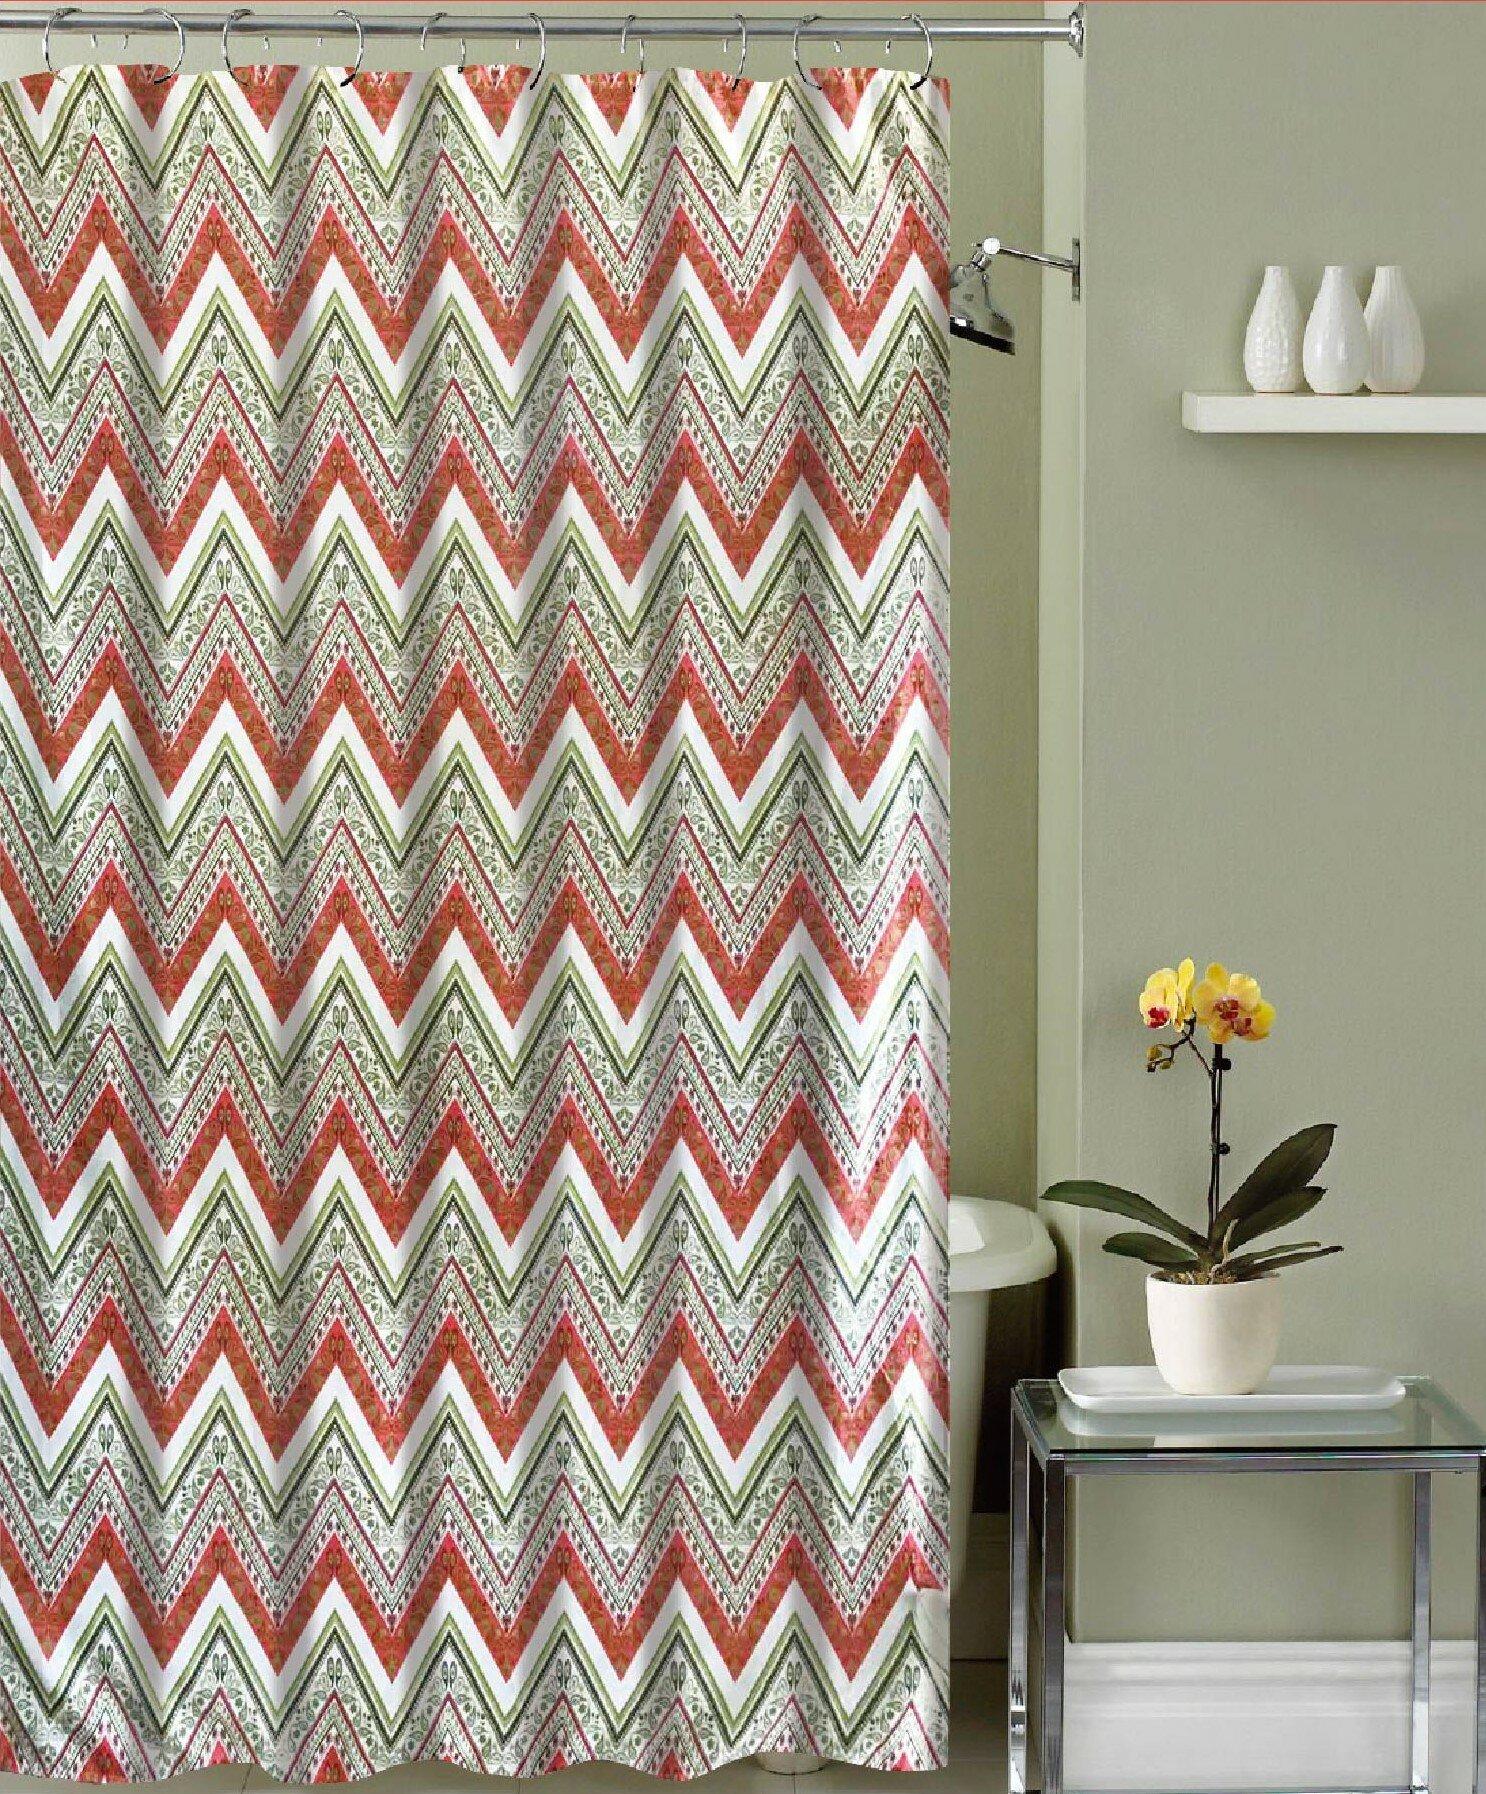 Red Barrel Studio Mirtha Chevron Canvas Fabric Shower Curtain   Wayfair